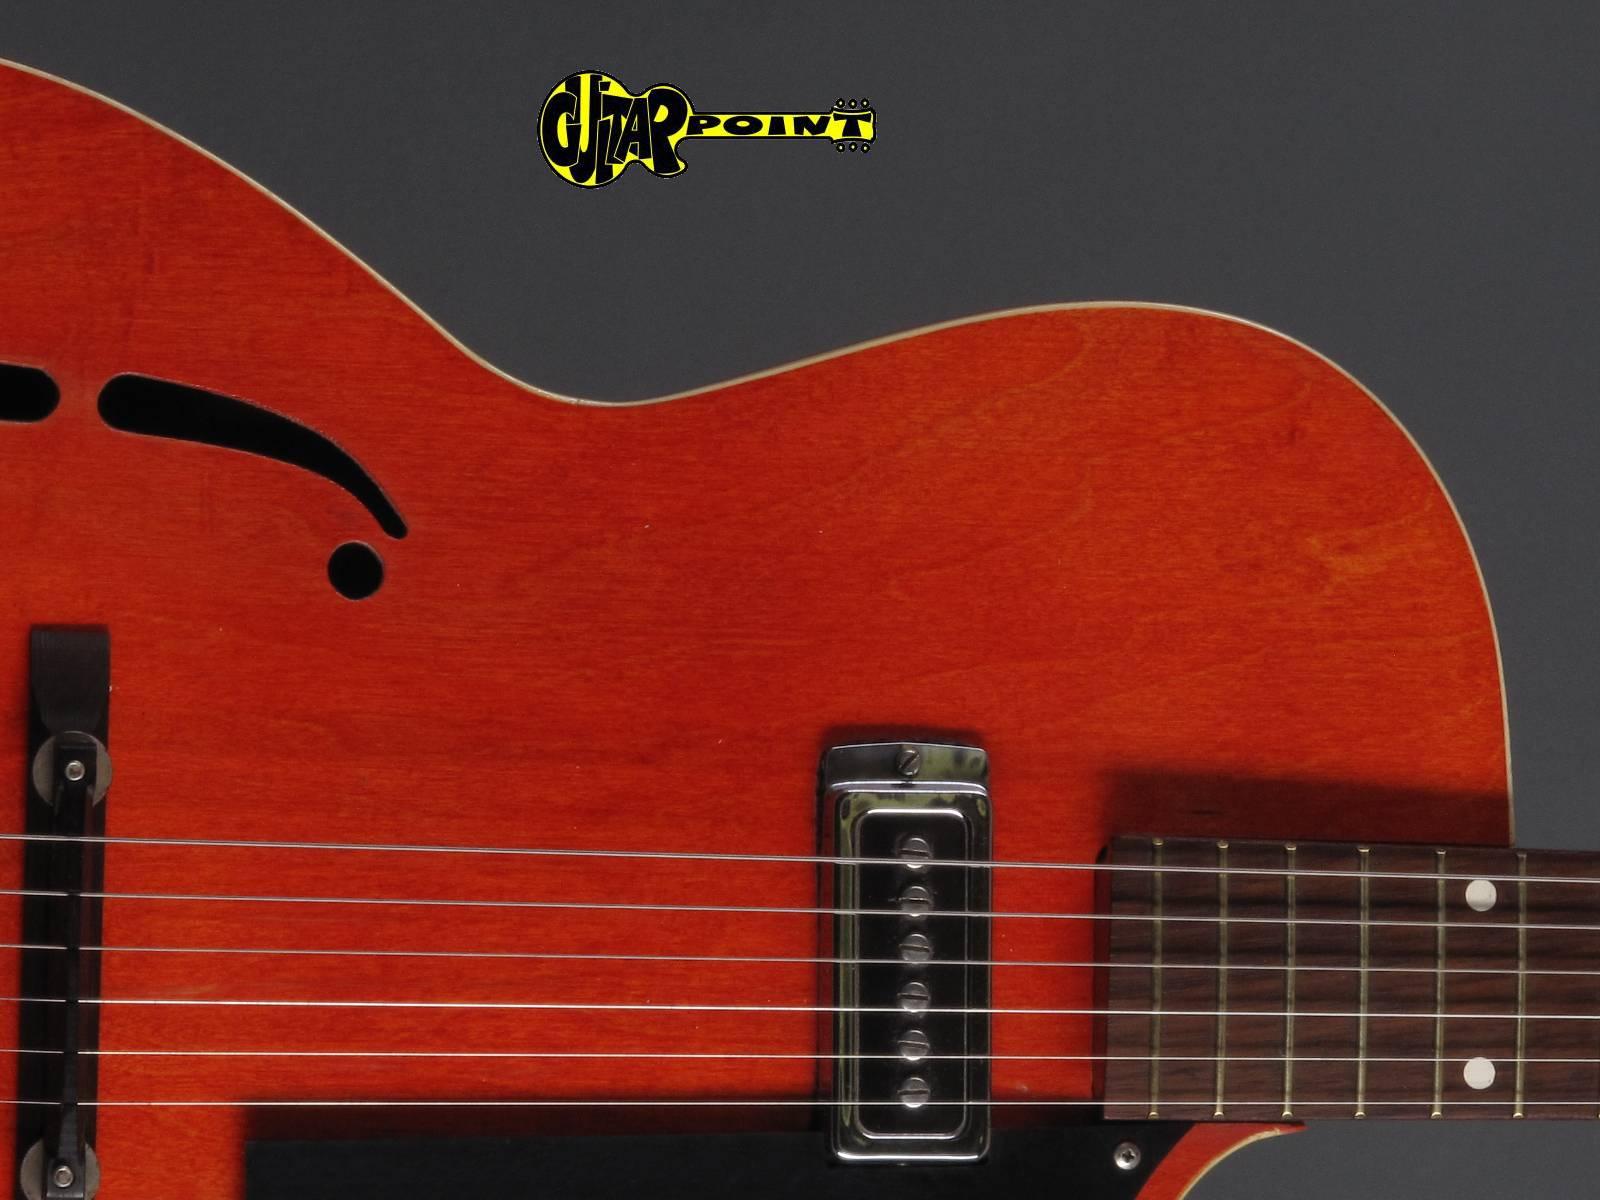 https://guitarpoint.de/app/uploads/products/1966-kay-speed-demon-k561-red/KAY66SpeedDemonRed_19.jpg